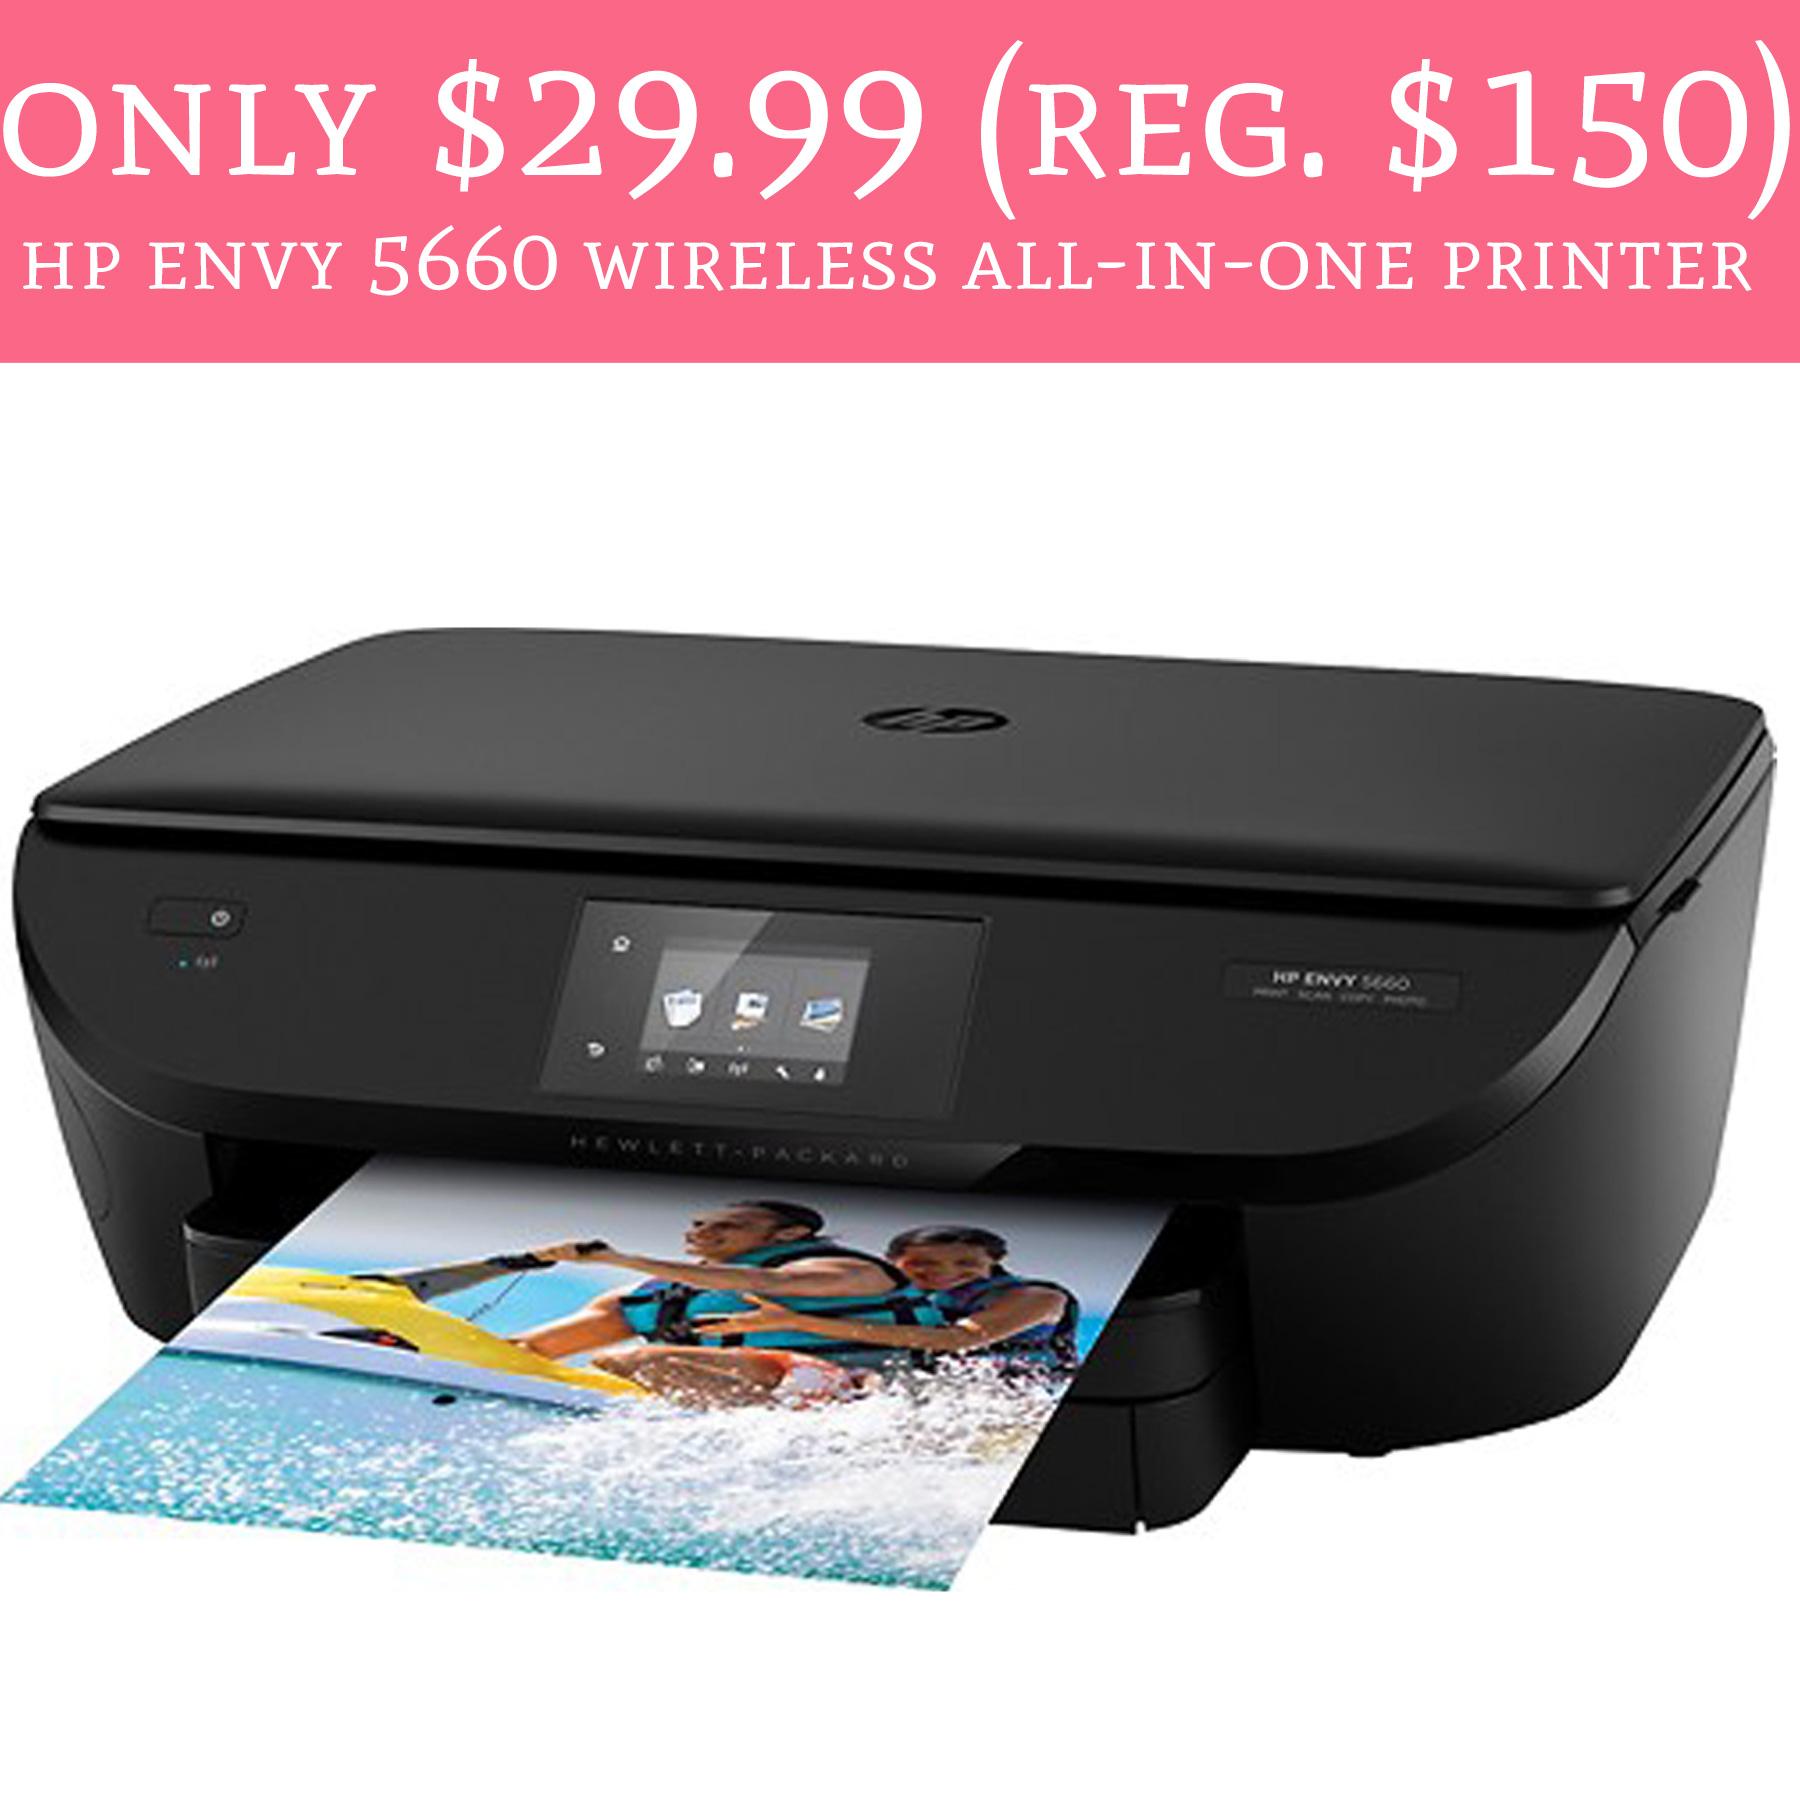 Only 29 99 Regular 150 Hp Envy 5660 Wireless All In